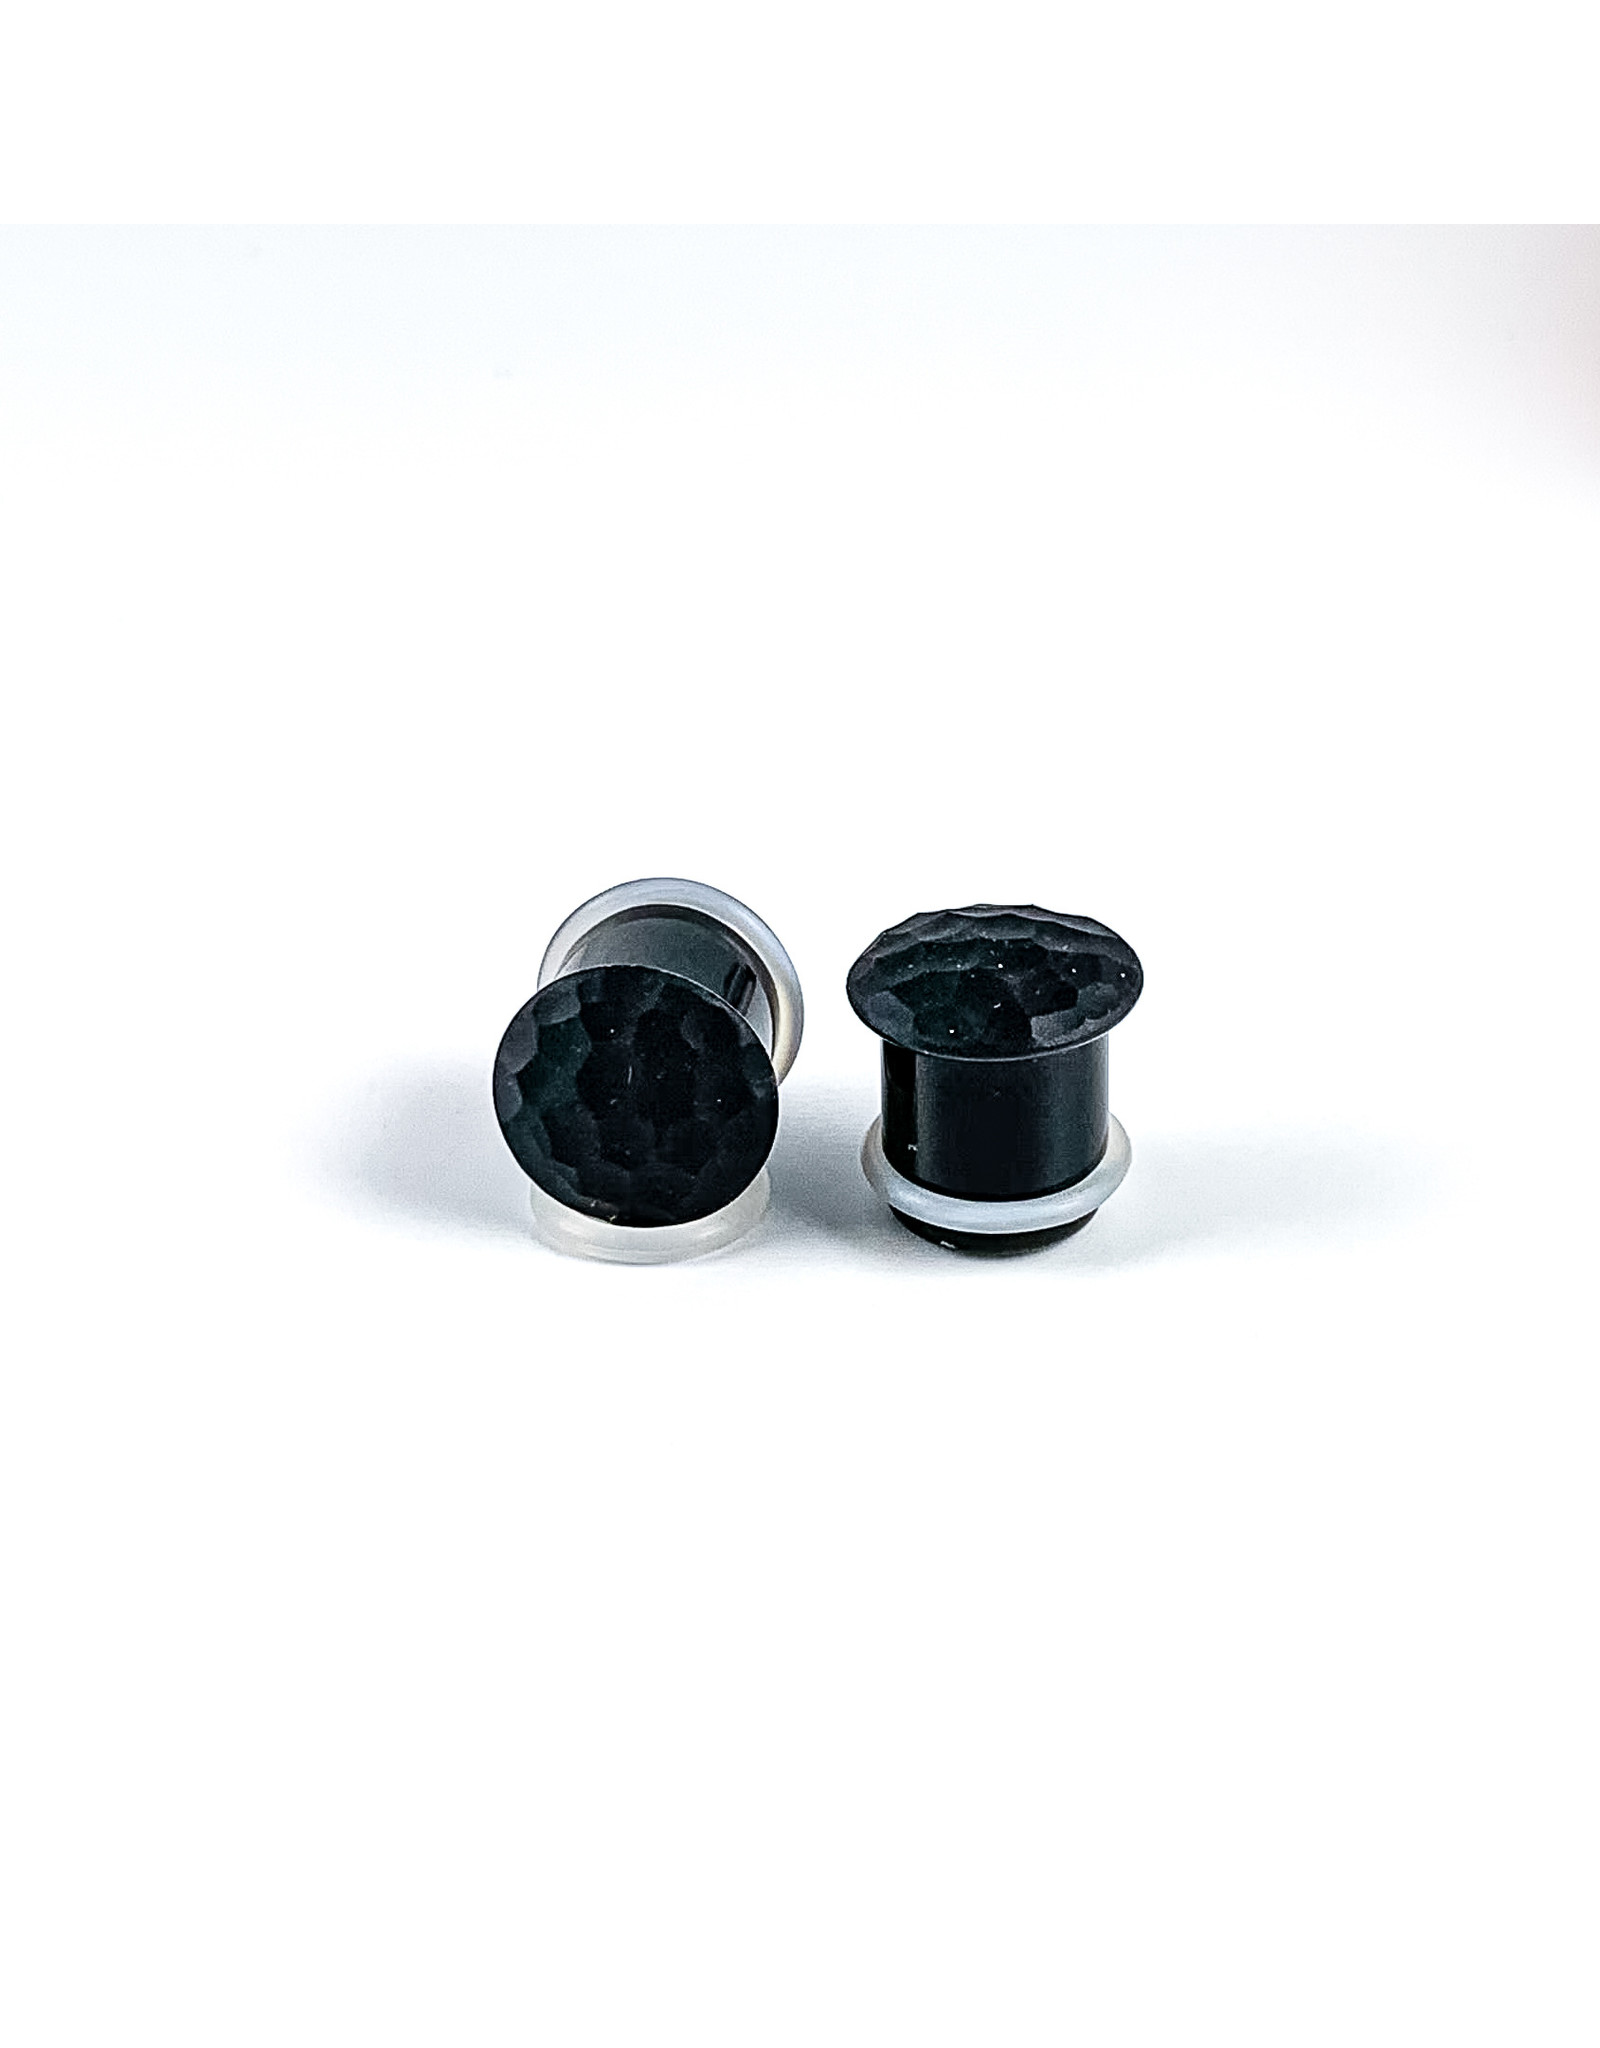 Gorilla Glass Gorilla Glass Martelle texture single flared plug